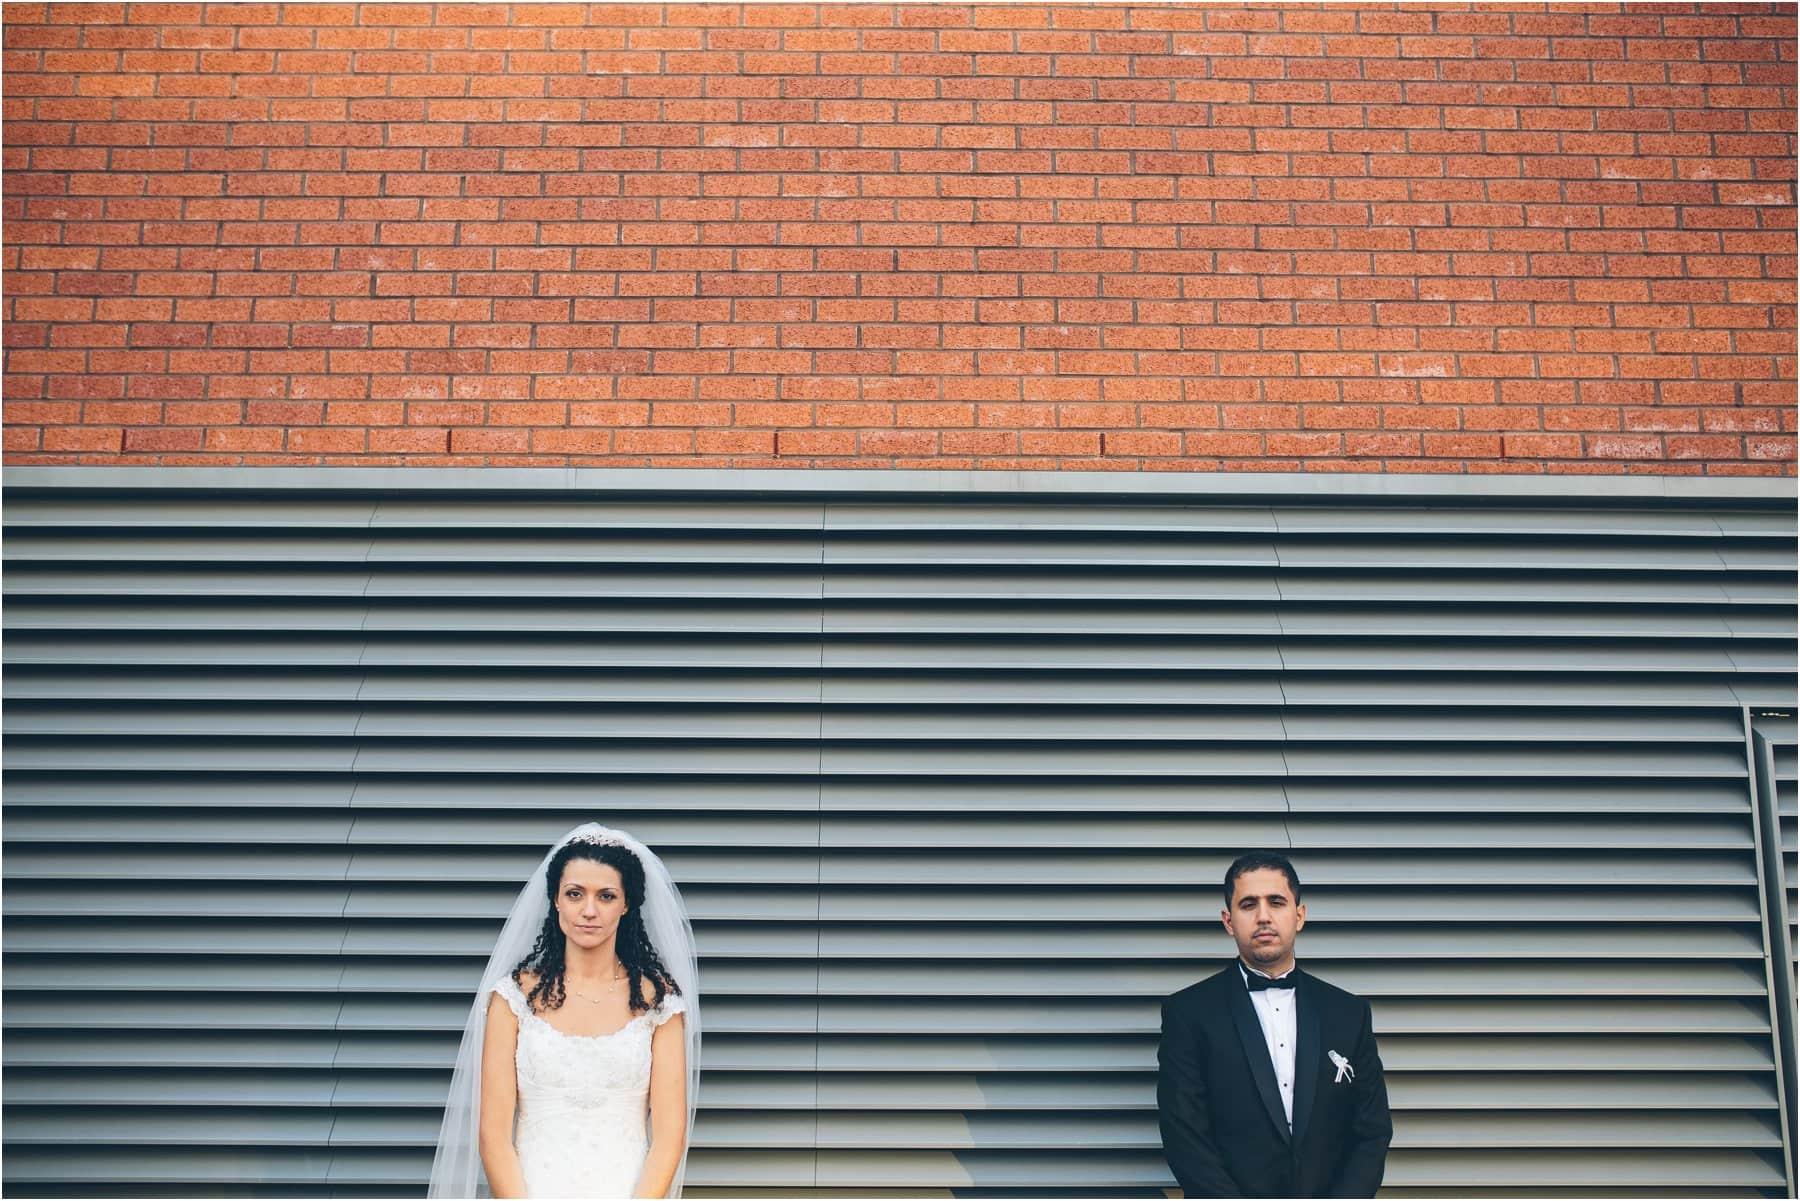 Midland_Manchester_Wedding_Photography_0092